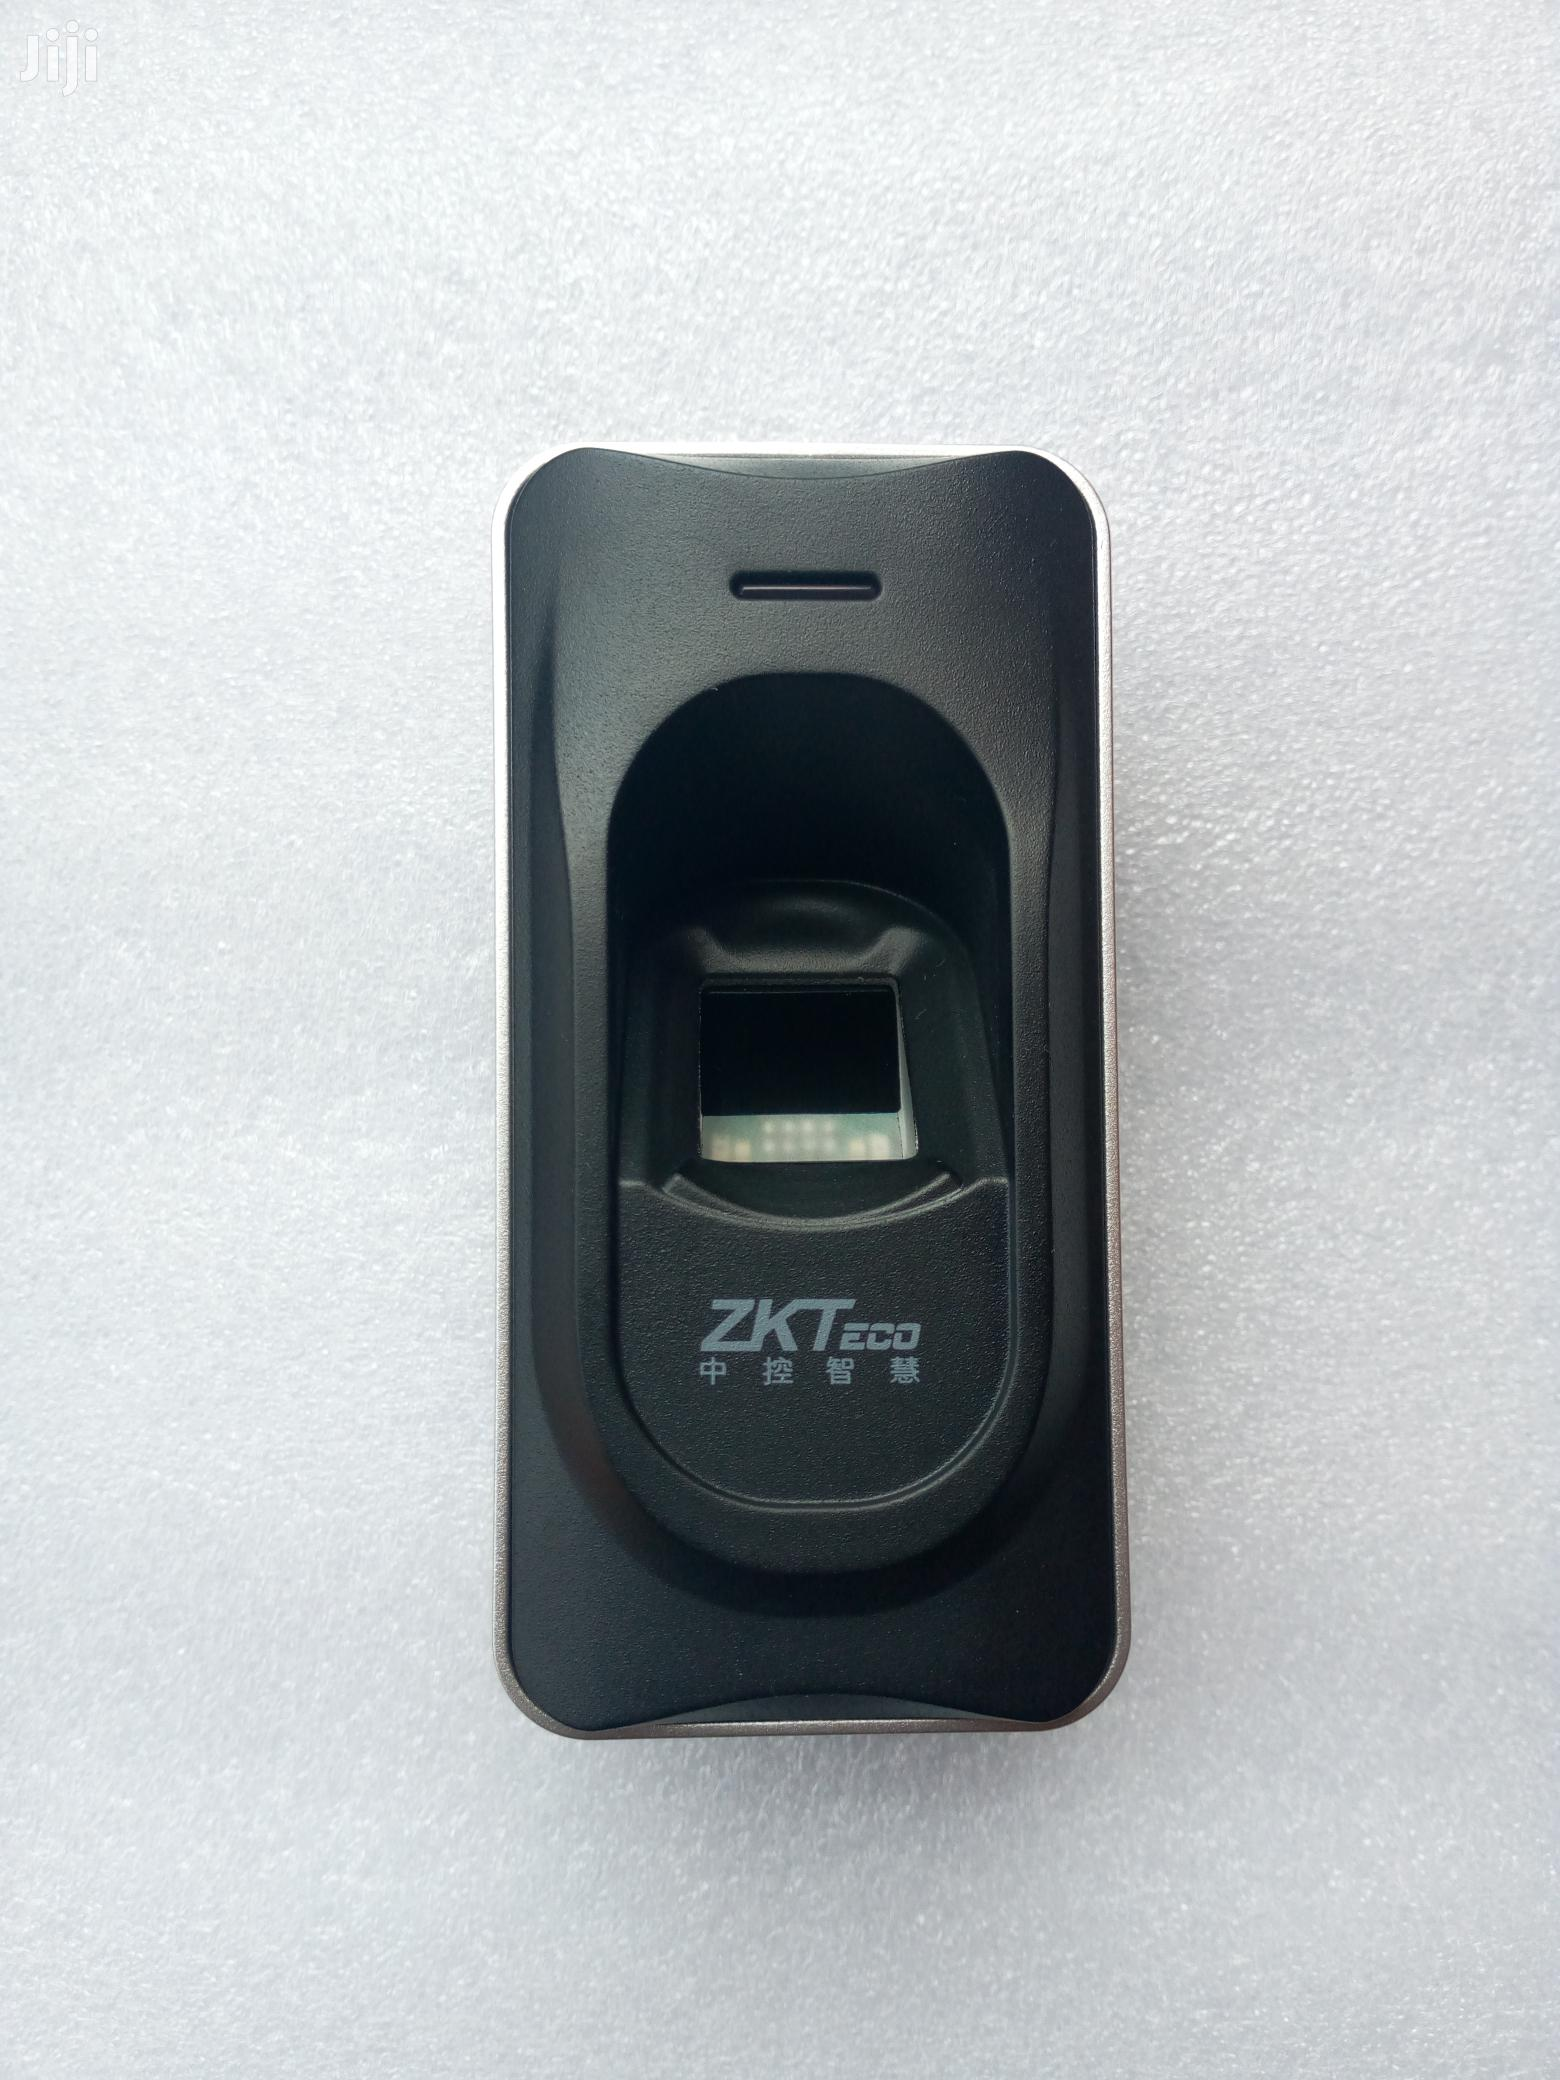 Zkteco FR1200 Fingerprint Reader Access Control | Computer Accessories  for sale in Ikeja, Lagos State, Nigeria